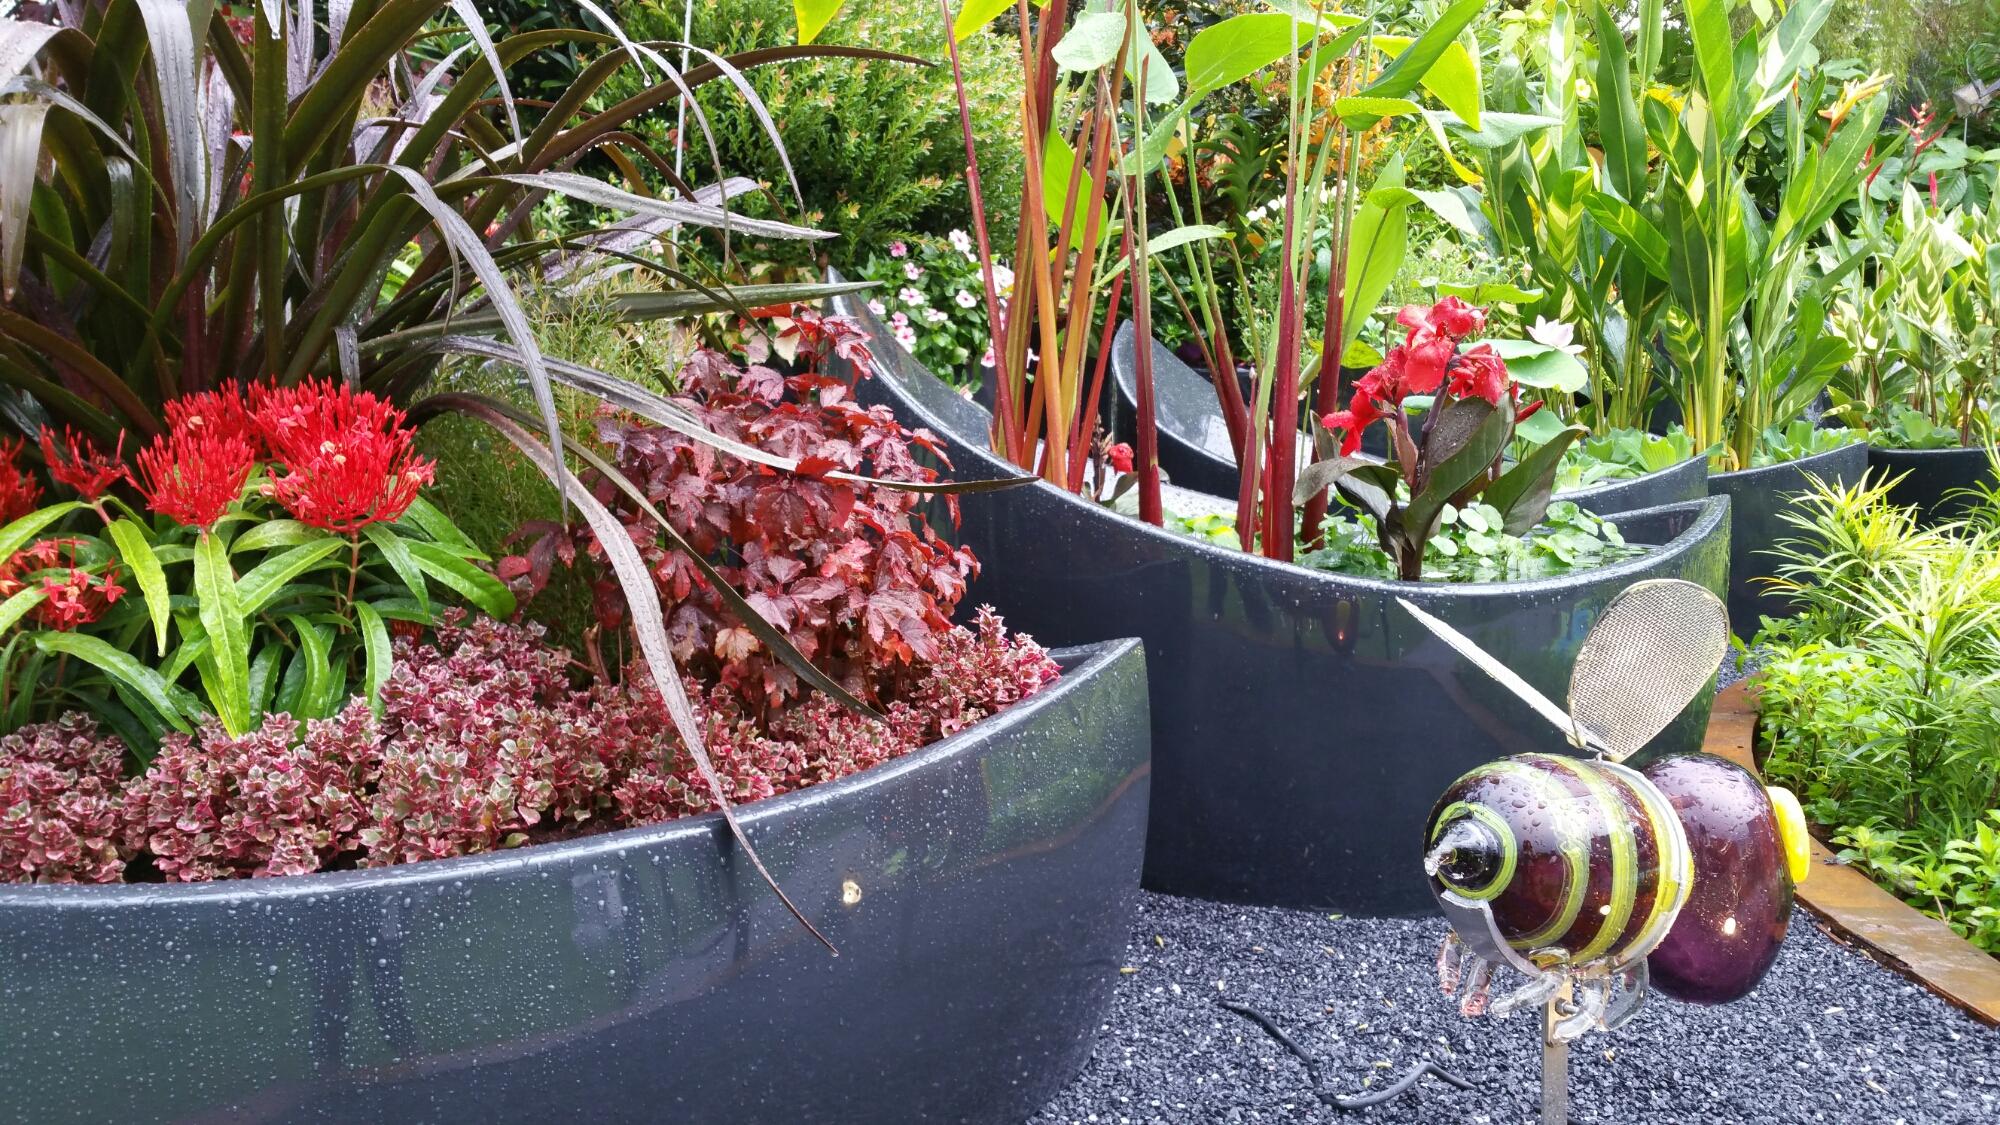 Sgf pot gardening image workwithnaturefo